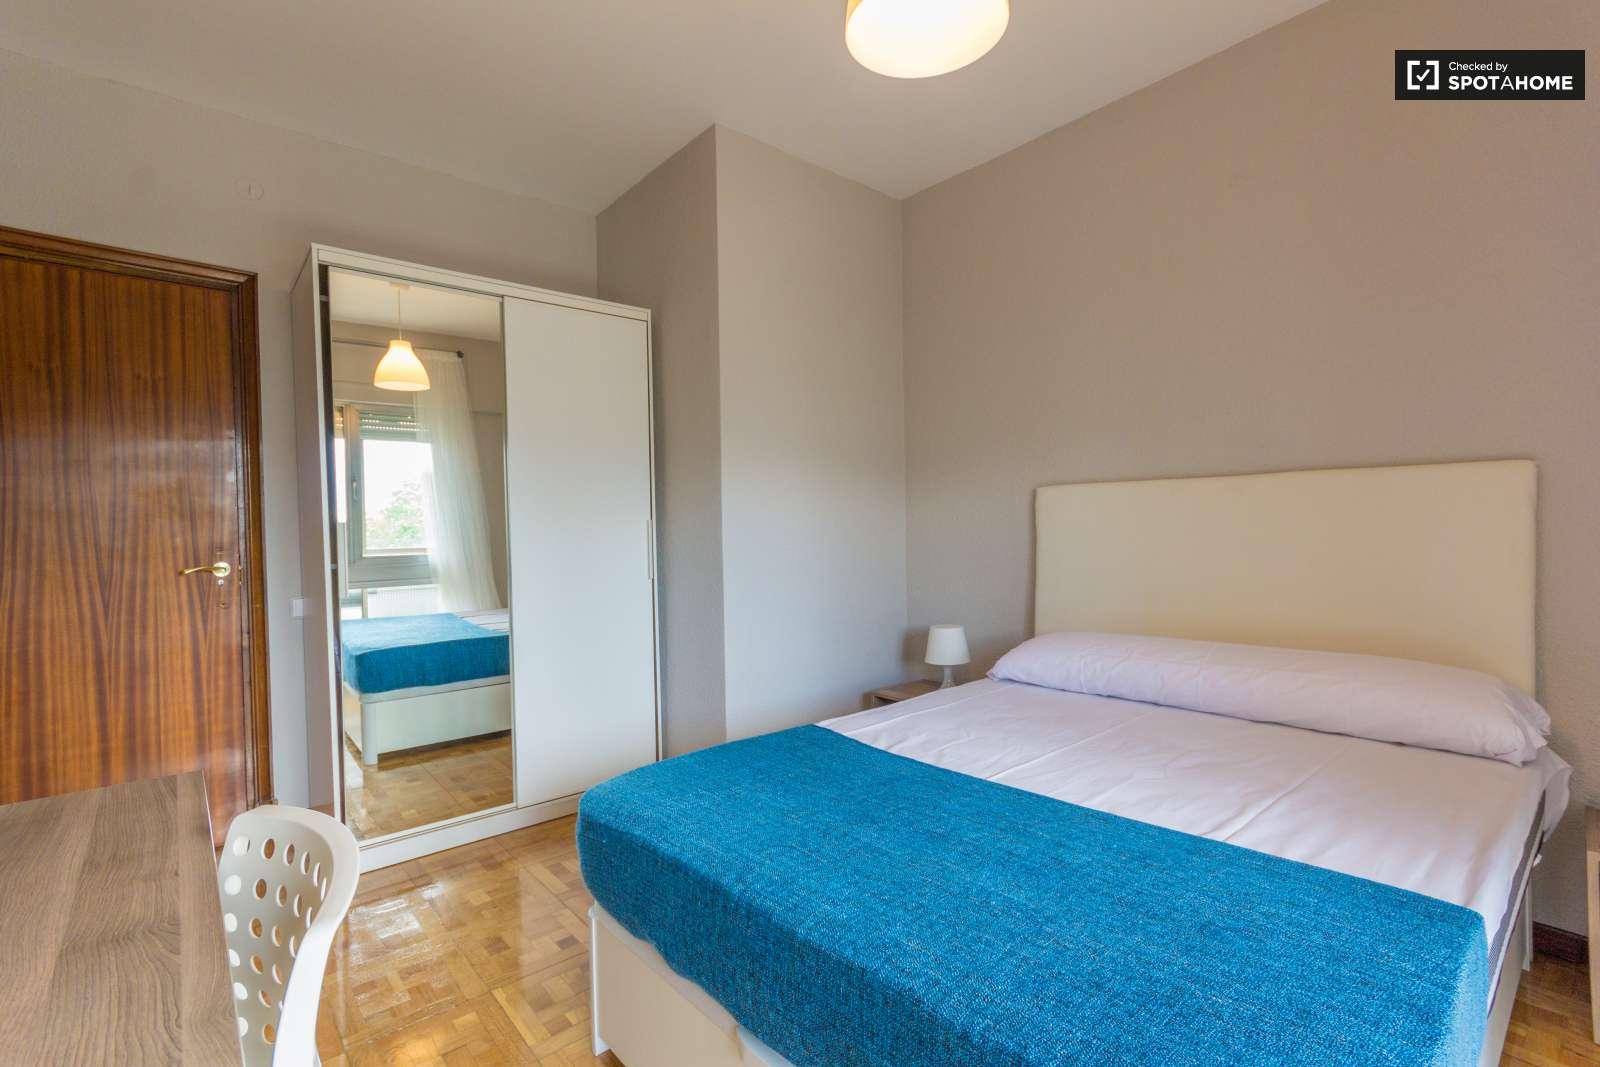 rooms for rent in 5 bedroom apartment principe pio